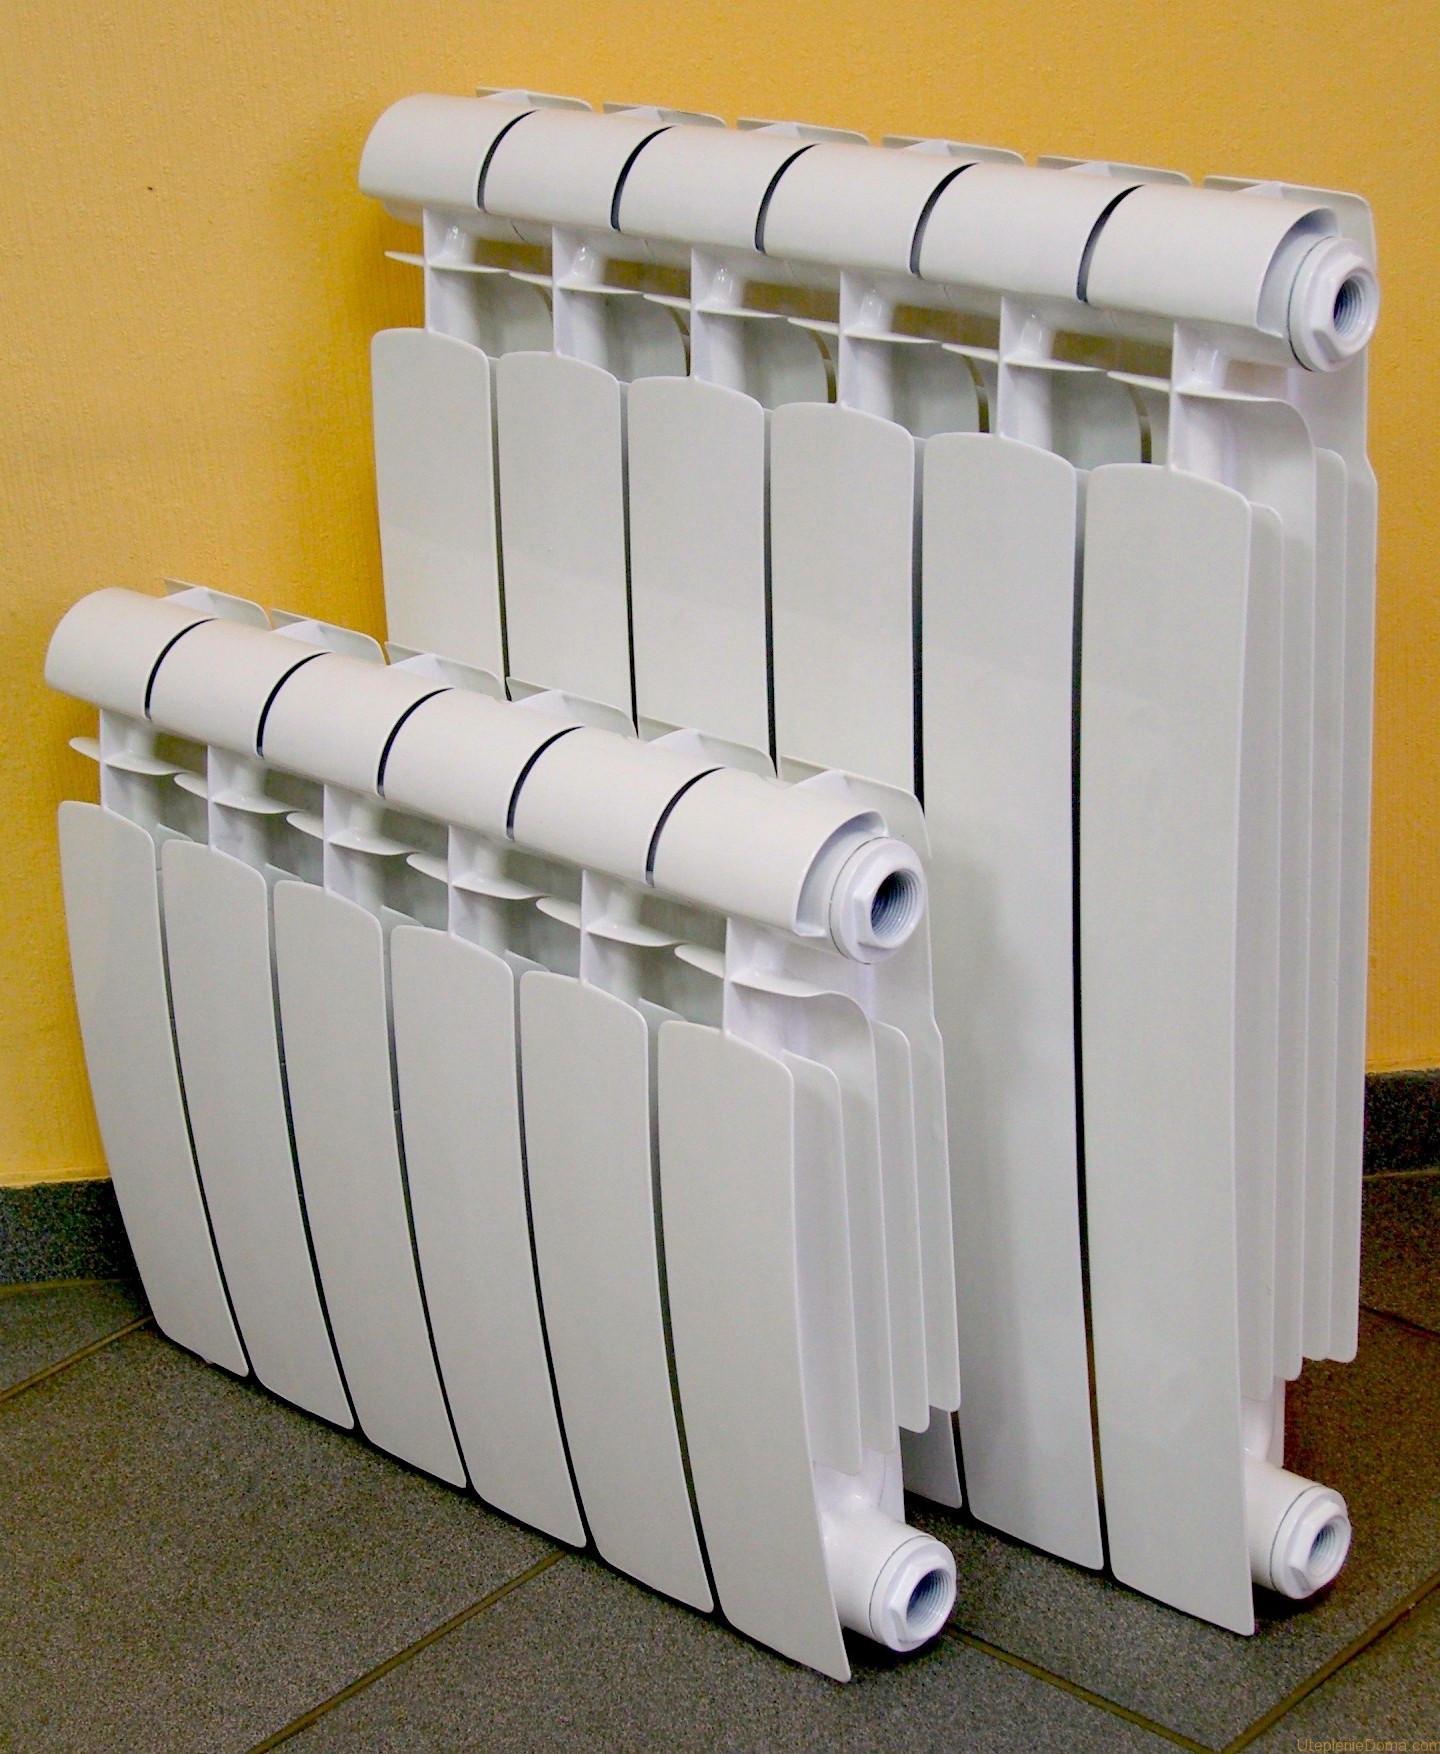 Батареи для отопления